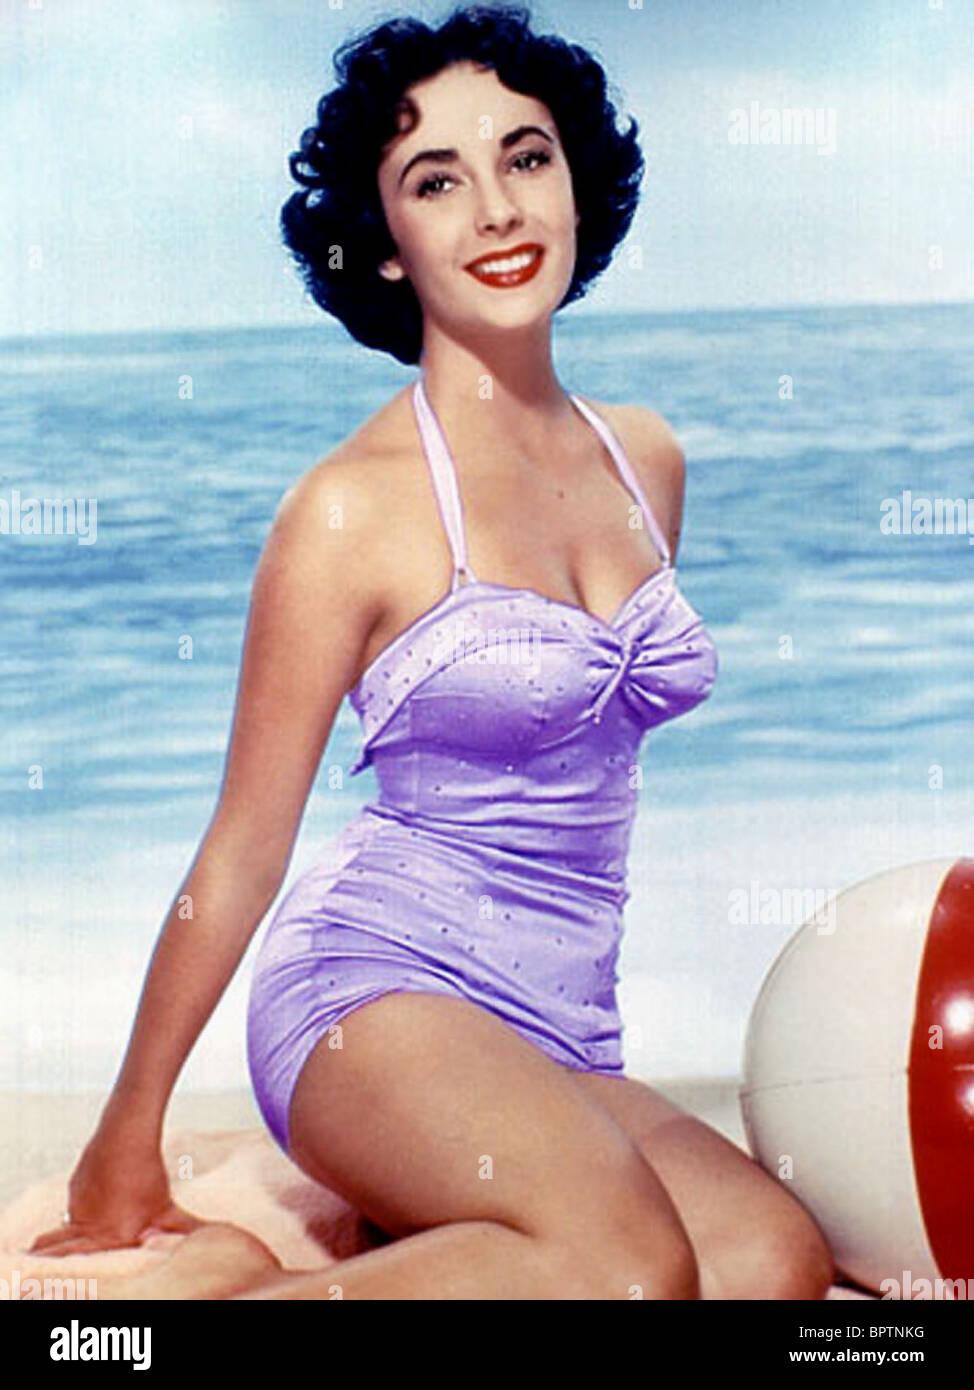 ELIZABETH TAYLOR ACTRESS (1955) - Stock Image